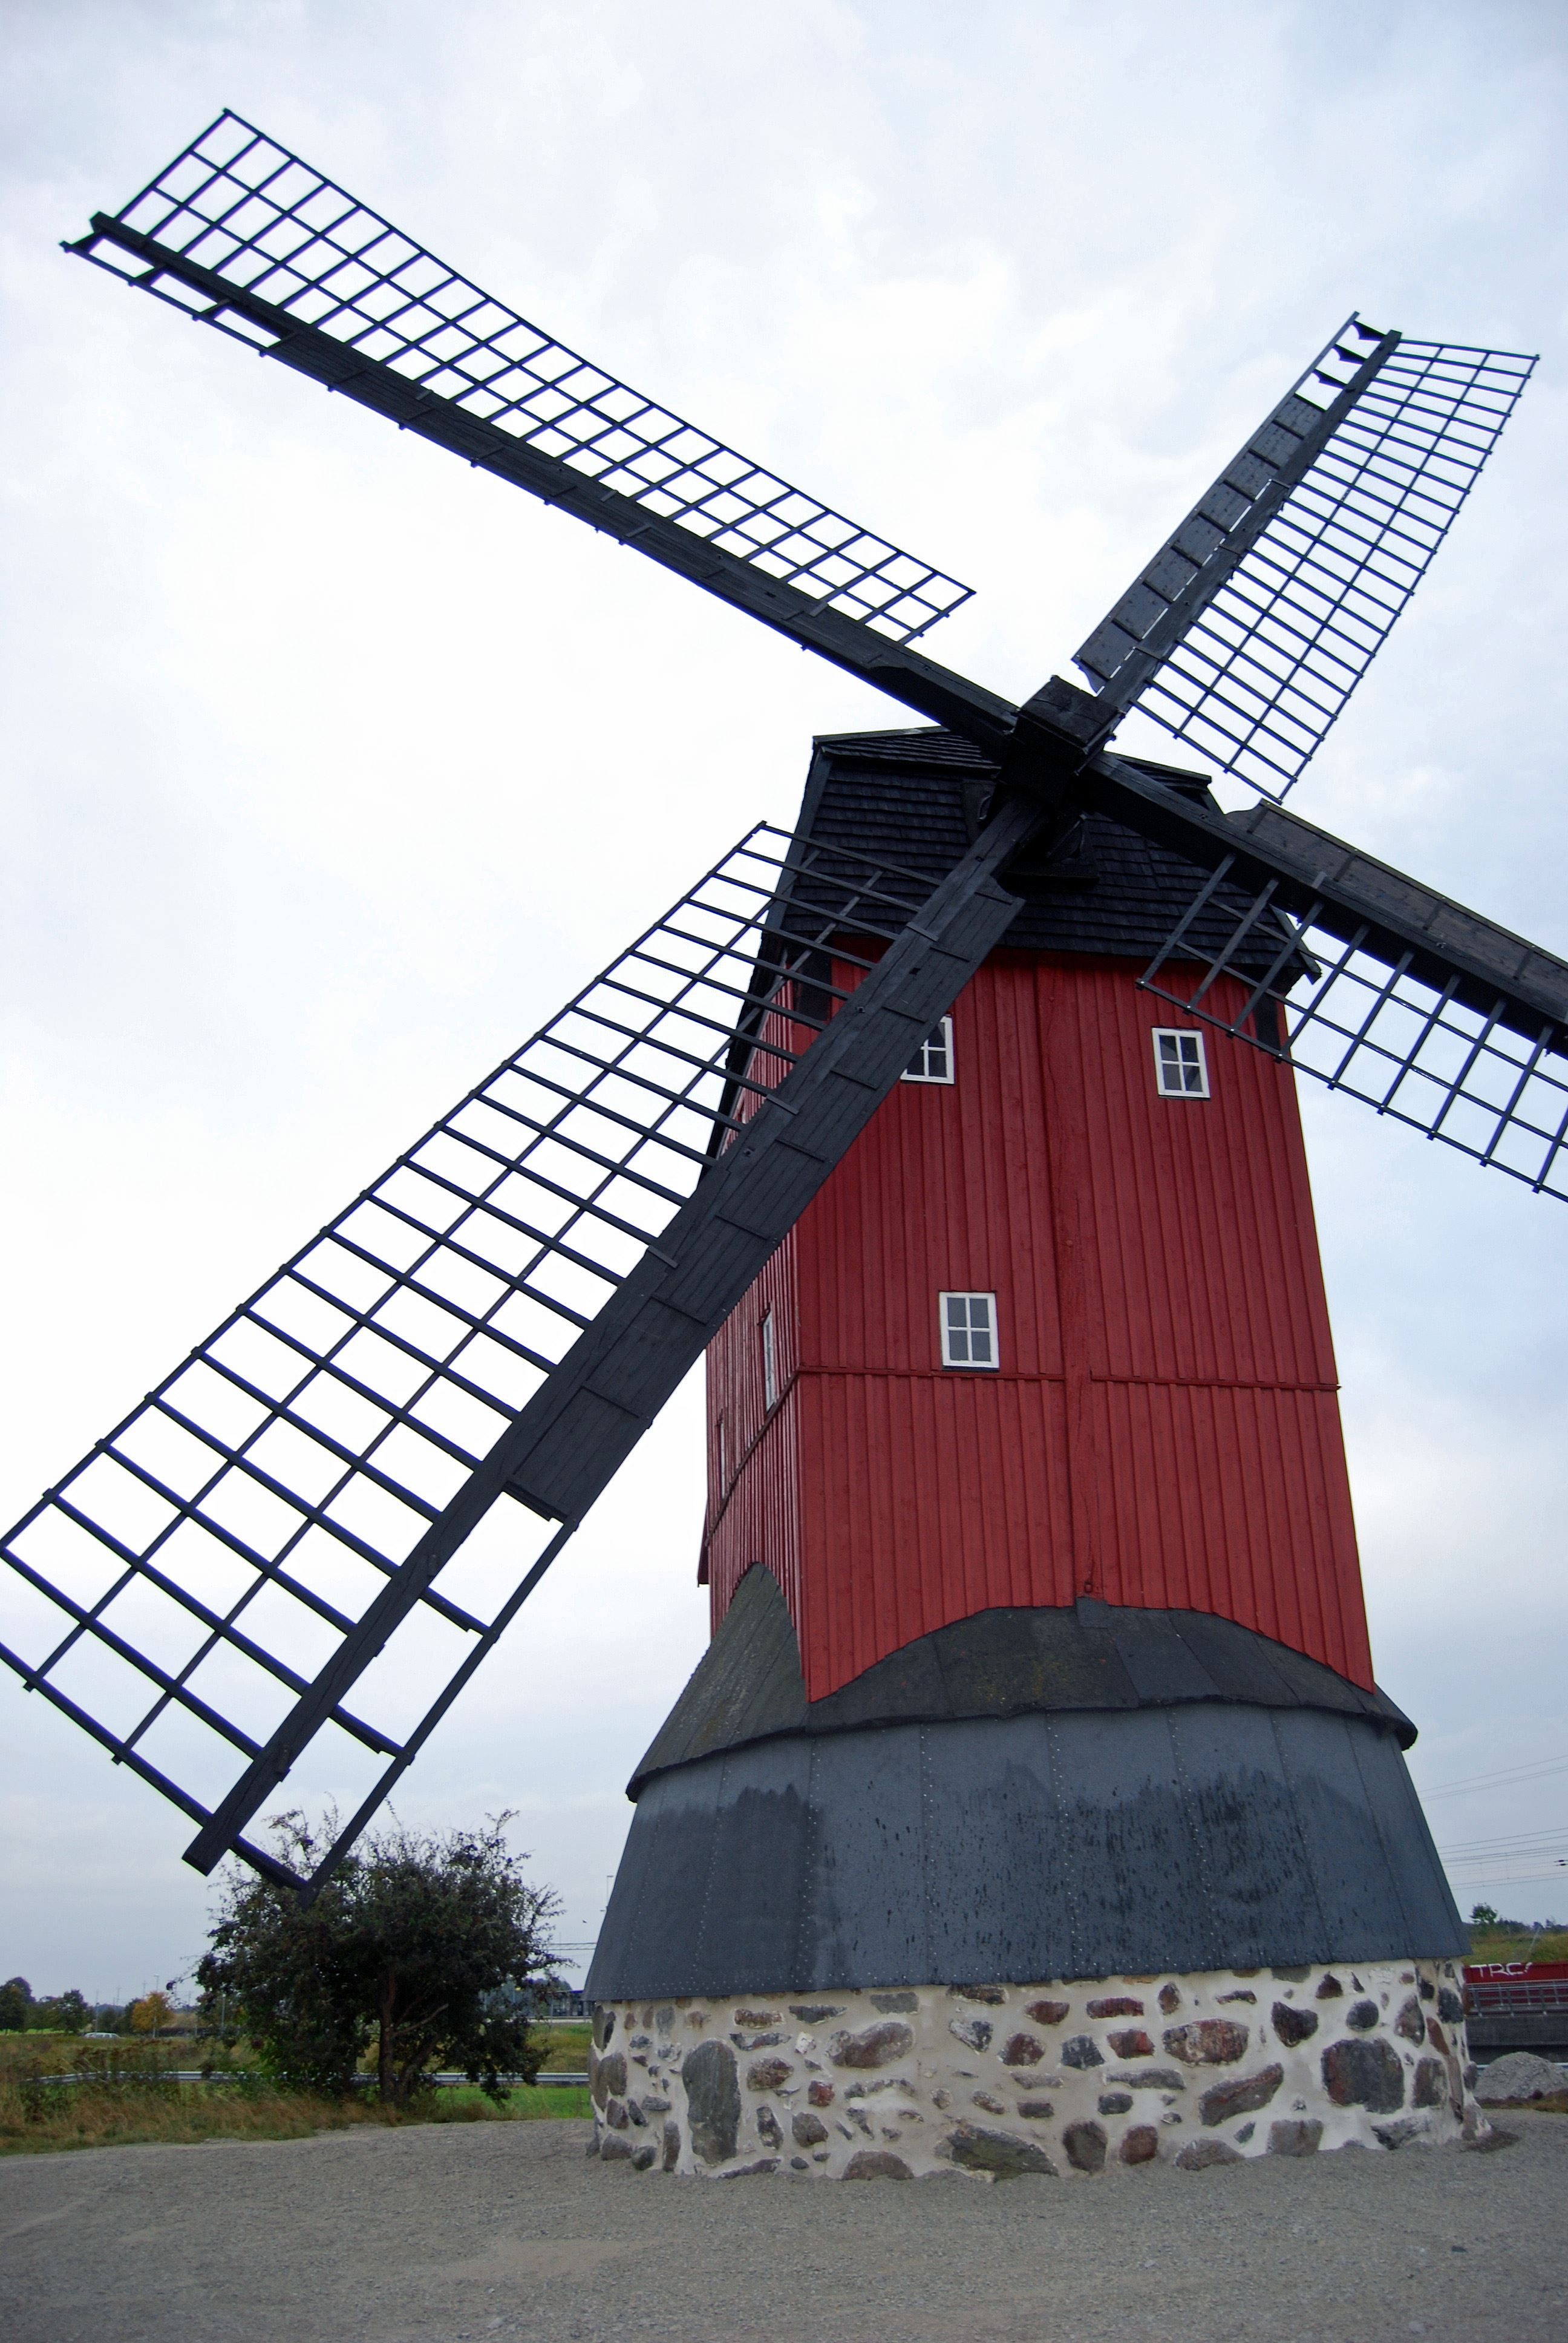 Asmundtorps Hembygdsgård/ Lindqvists smedja / Häljarps mölla